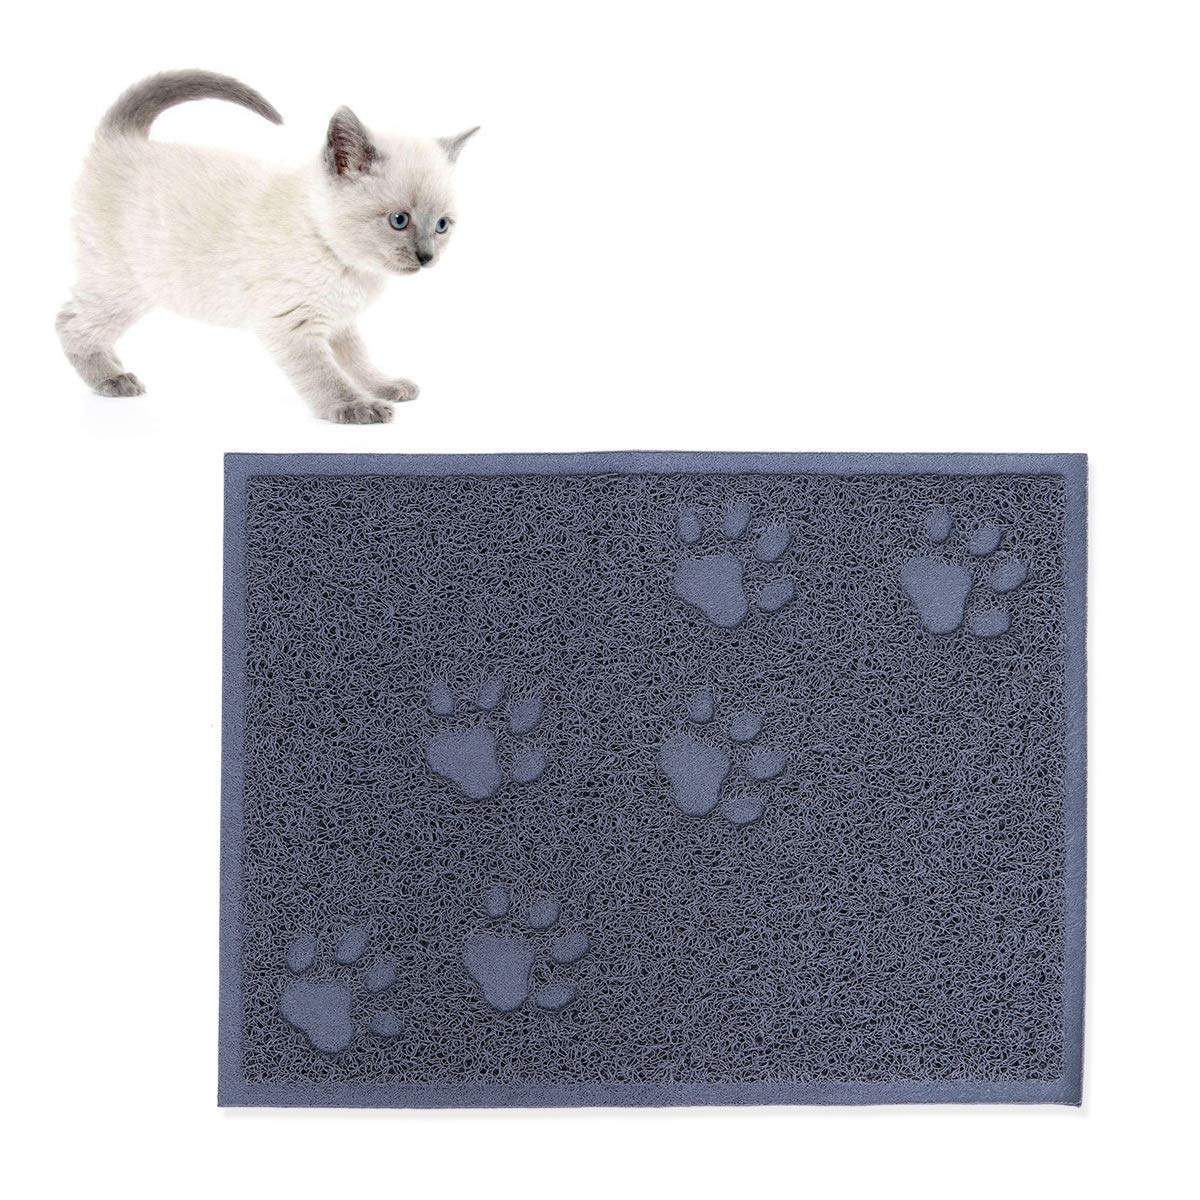 POPETPOP Estera de Arena para Gatos Impermeable de PVC Alfombra de Basura Rascadores Antideslizante Alfombra para Gato 30 x 40 cm Gris: Amazon.es: Productos ...